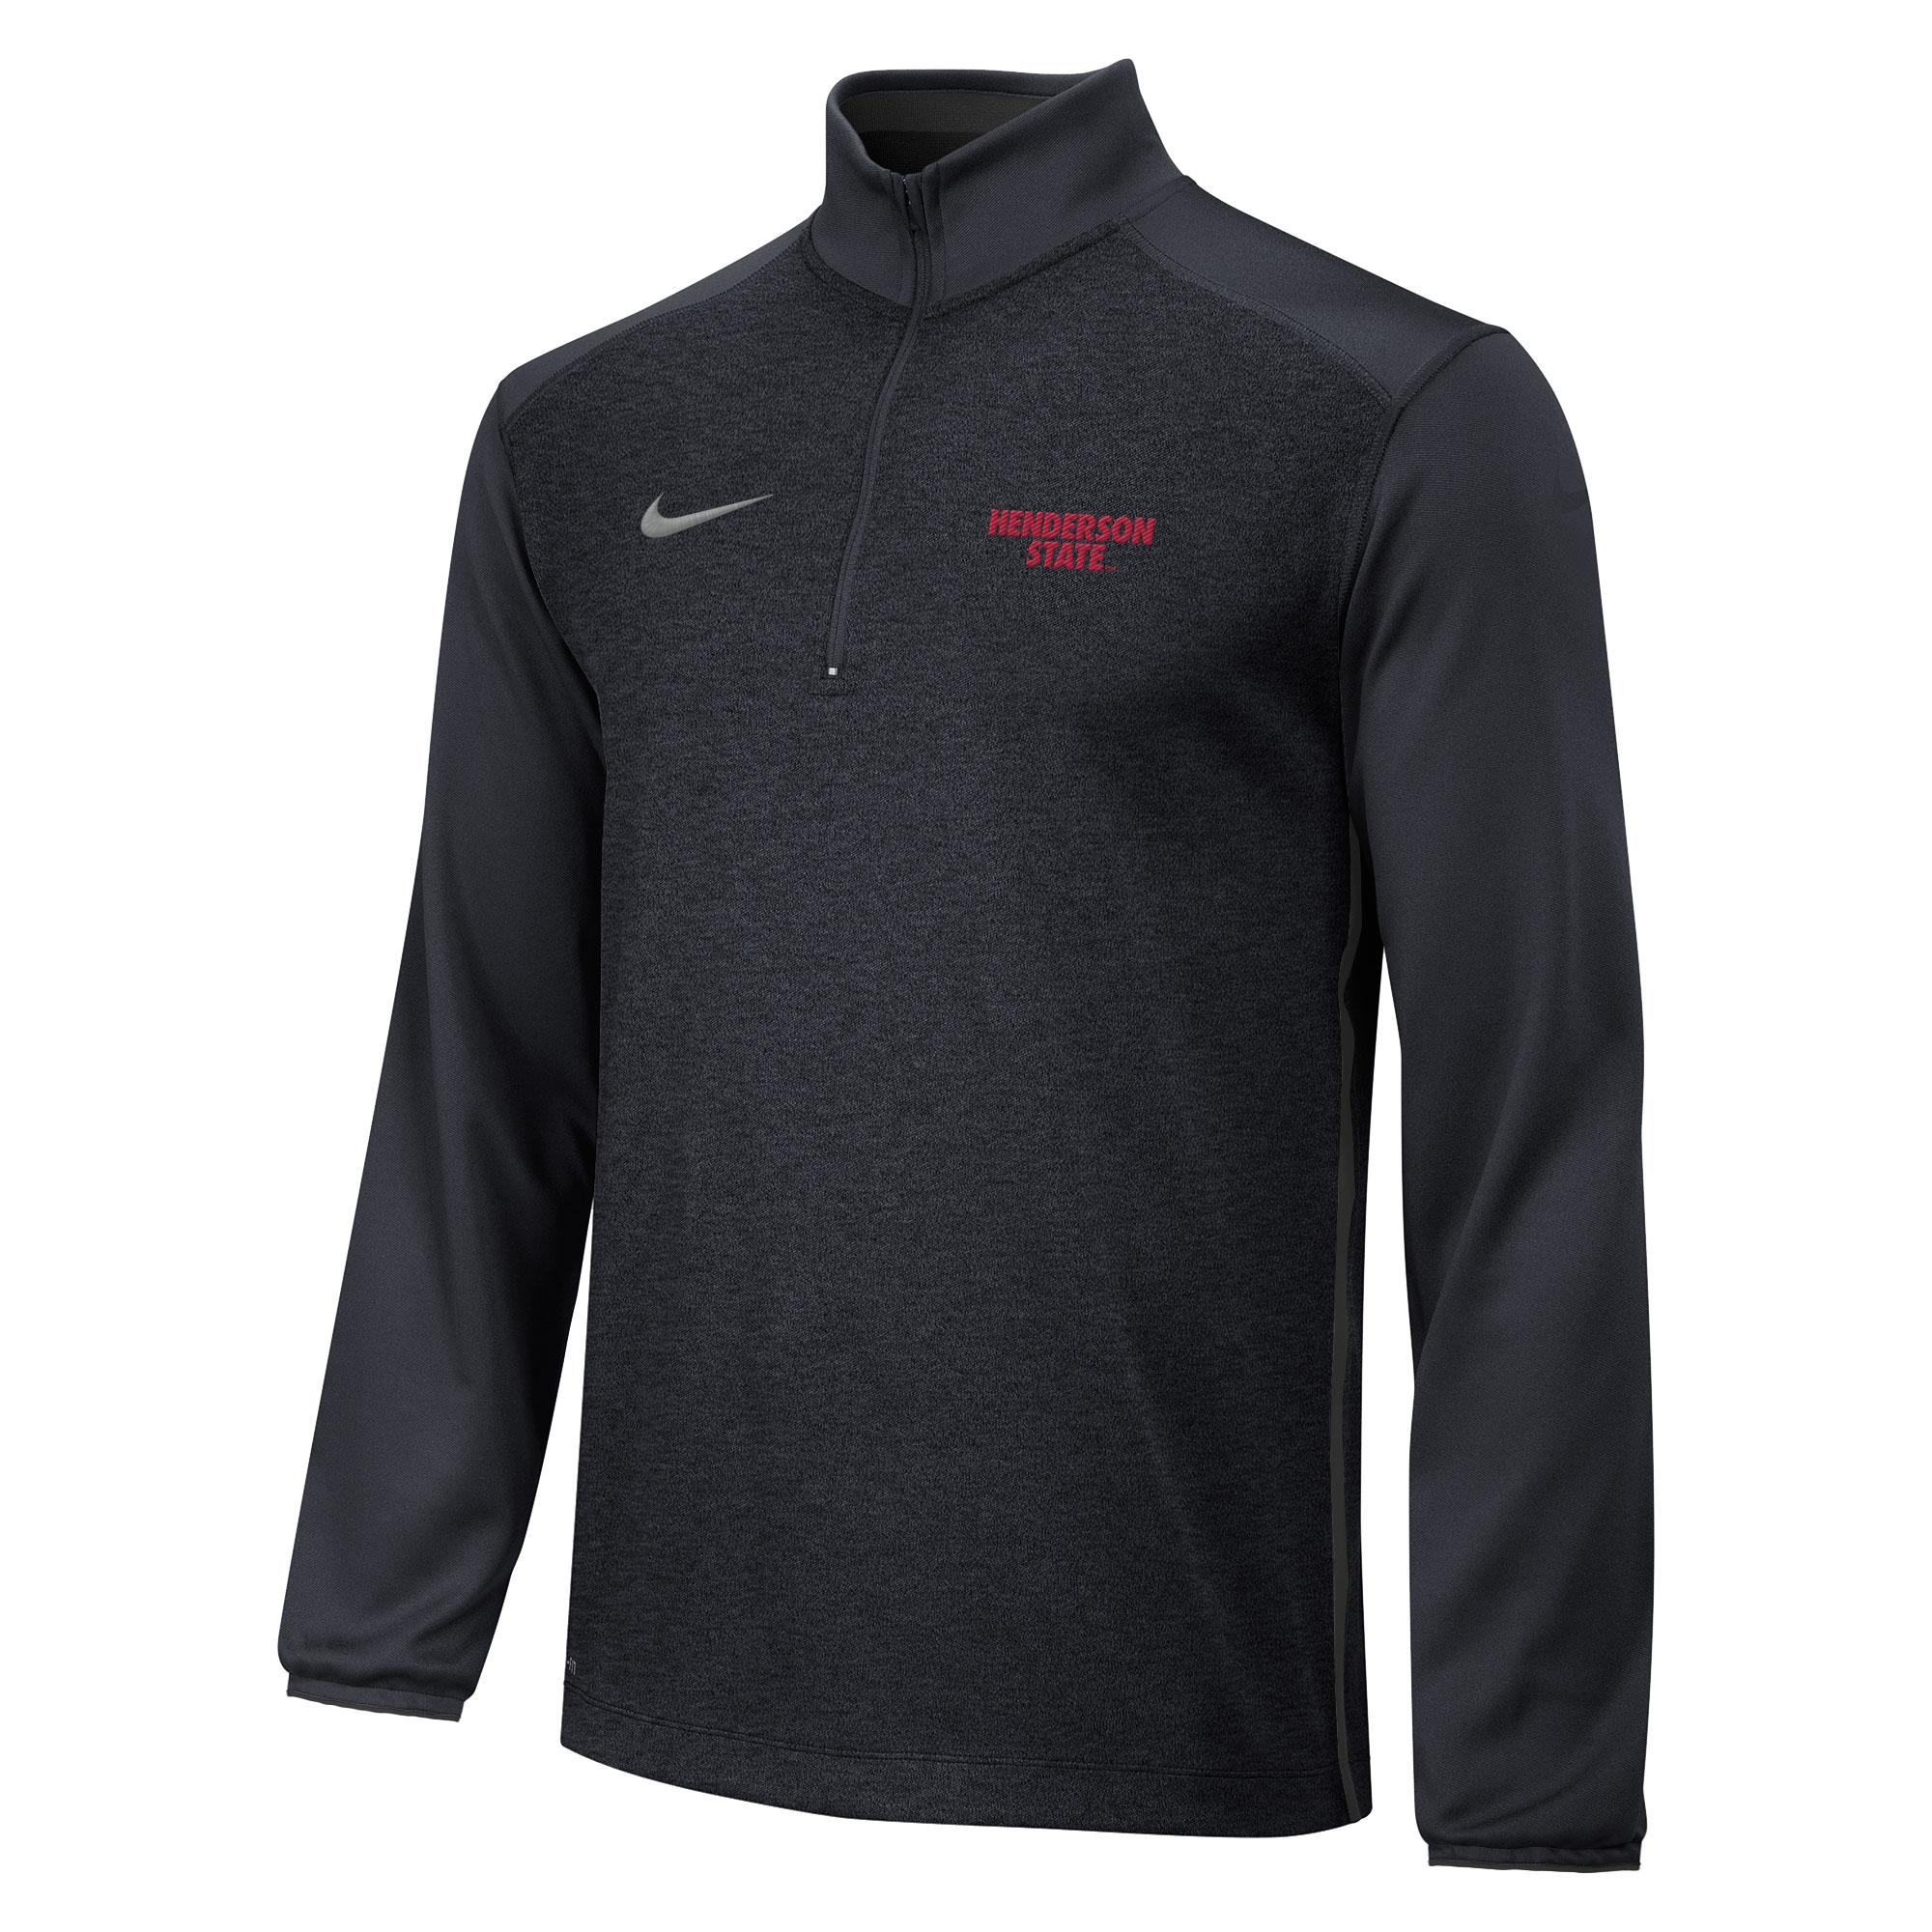 Nike Coaches 1/2 Zip